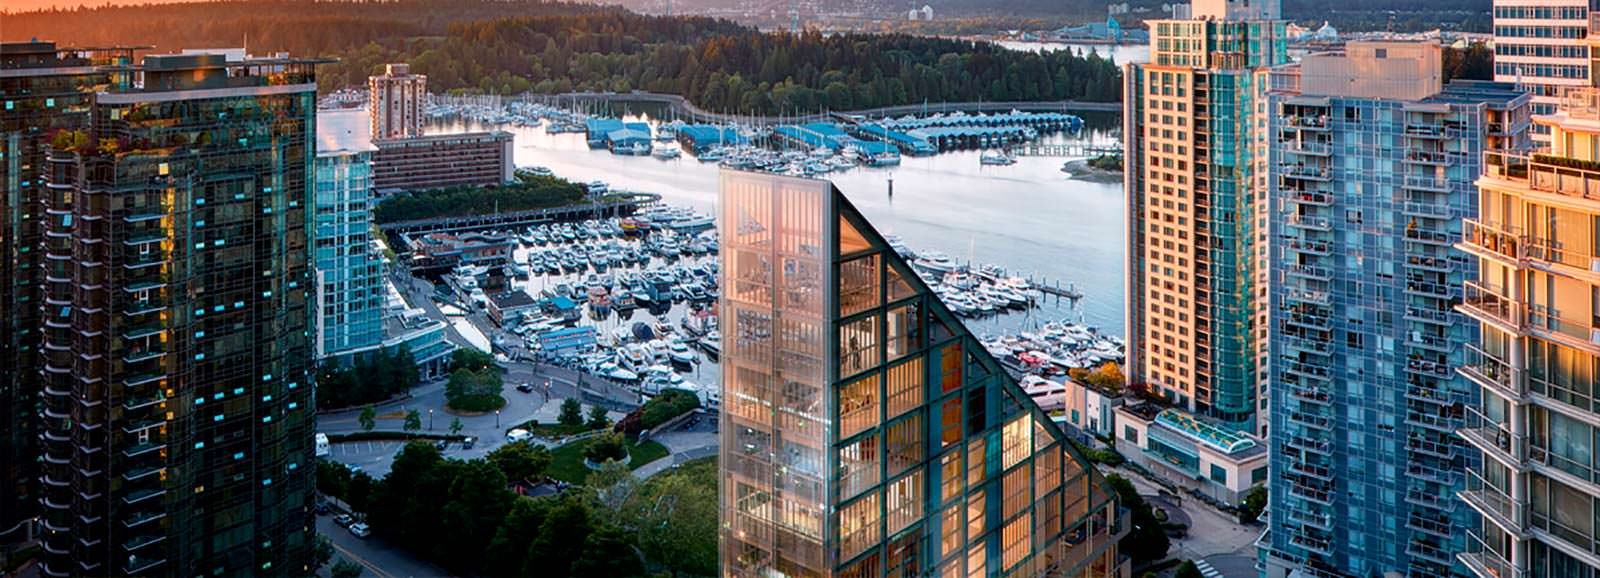 Вид на гавань Ванкувера с высоты Terrace House